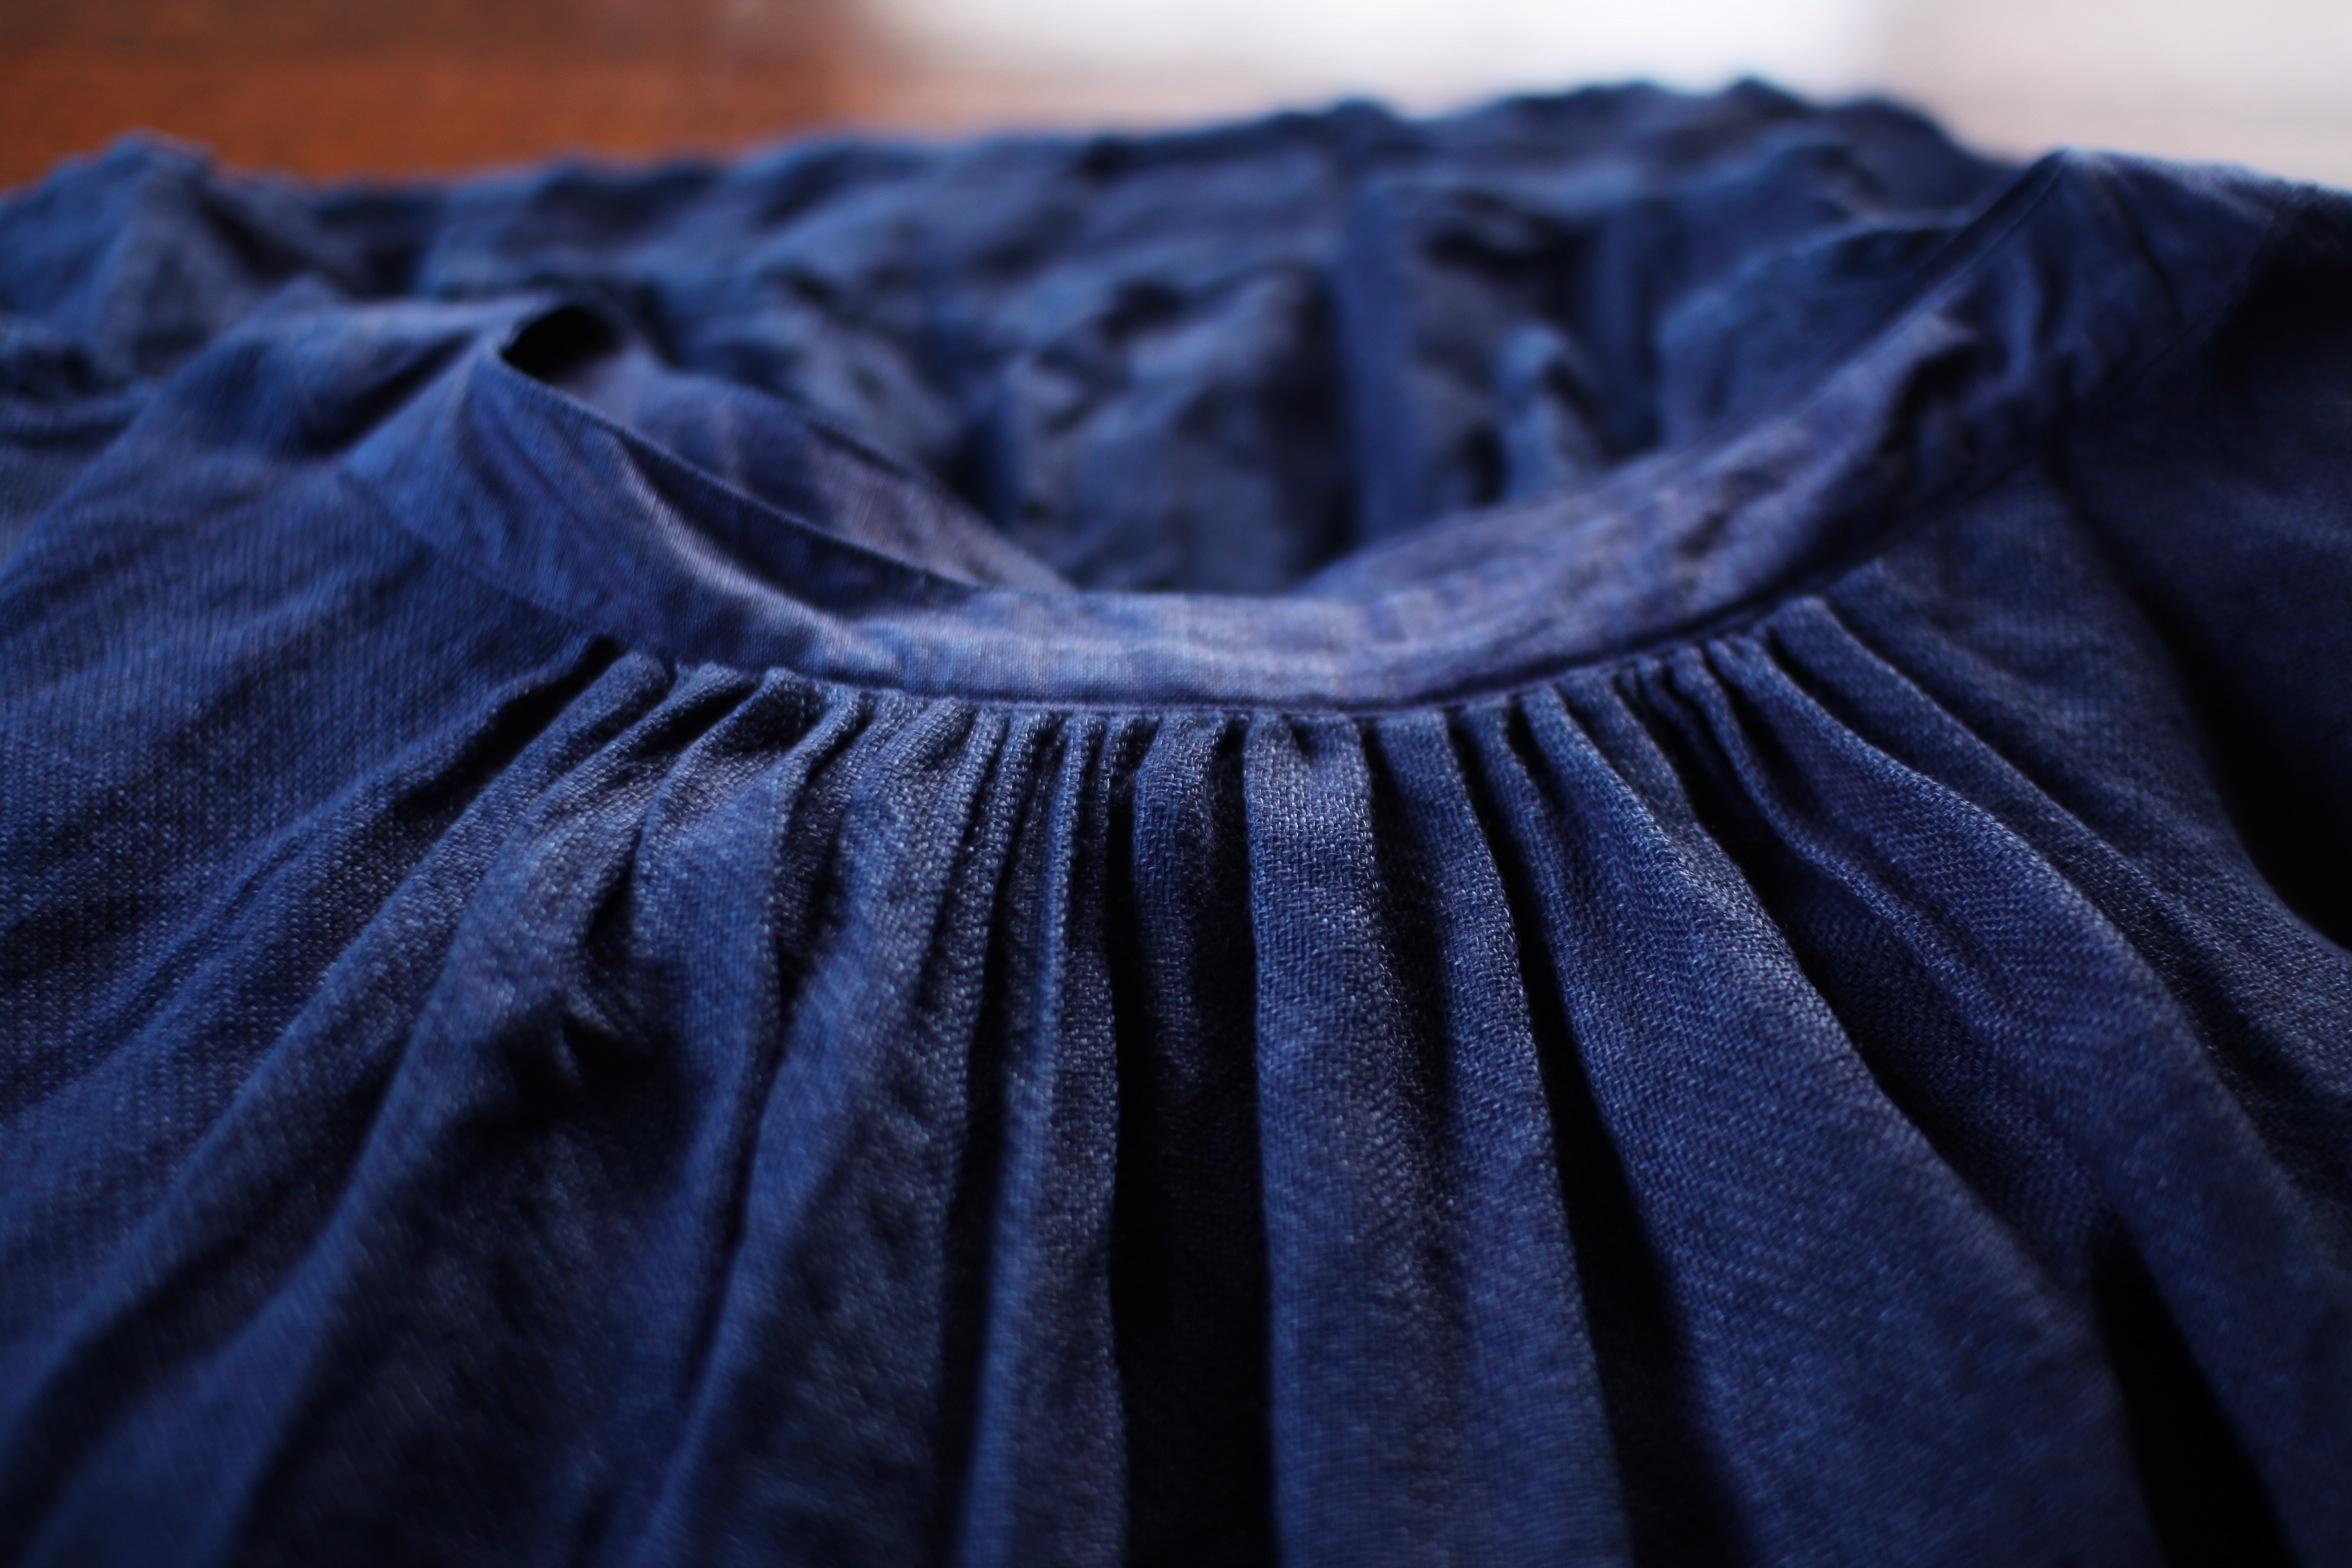 2015 Spring/Summer リネンダブルガーゼブラウス Linen double-gauze blouse(B-1503)